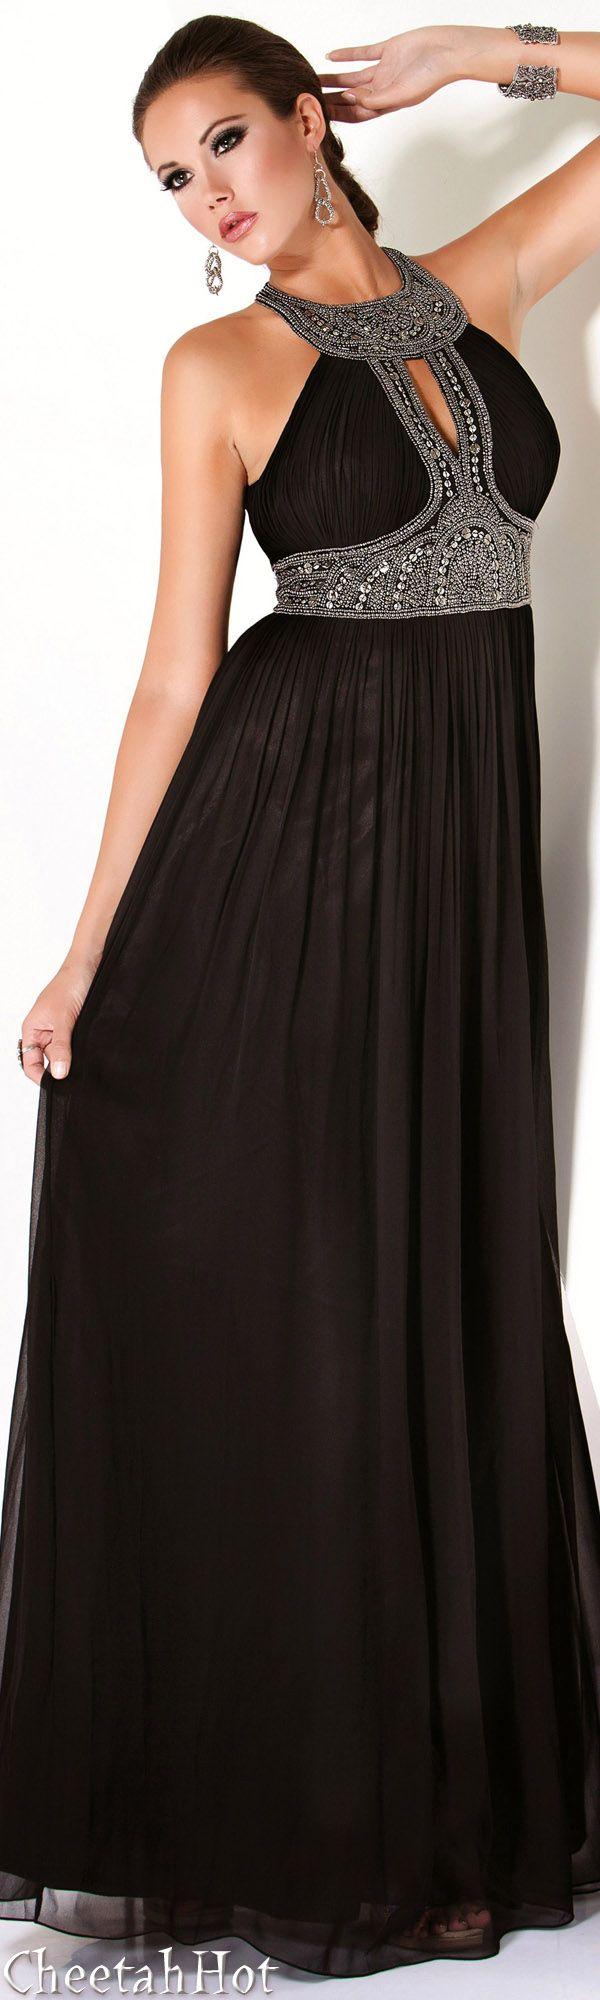 JOVANI - Beautiful Long Gown